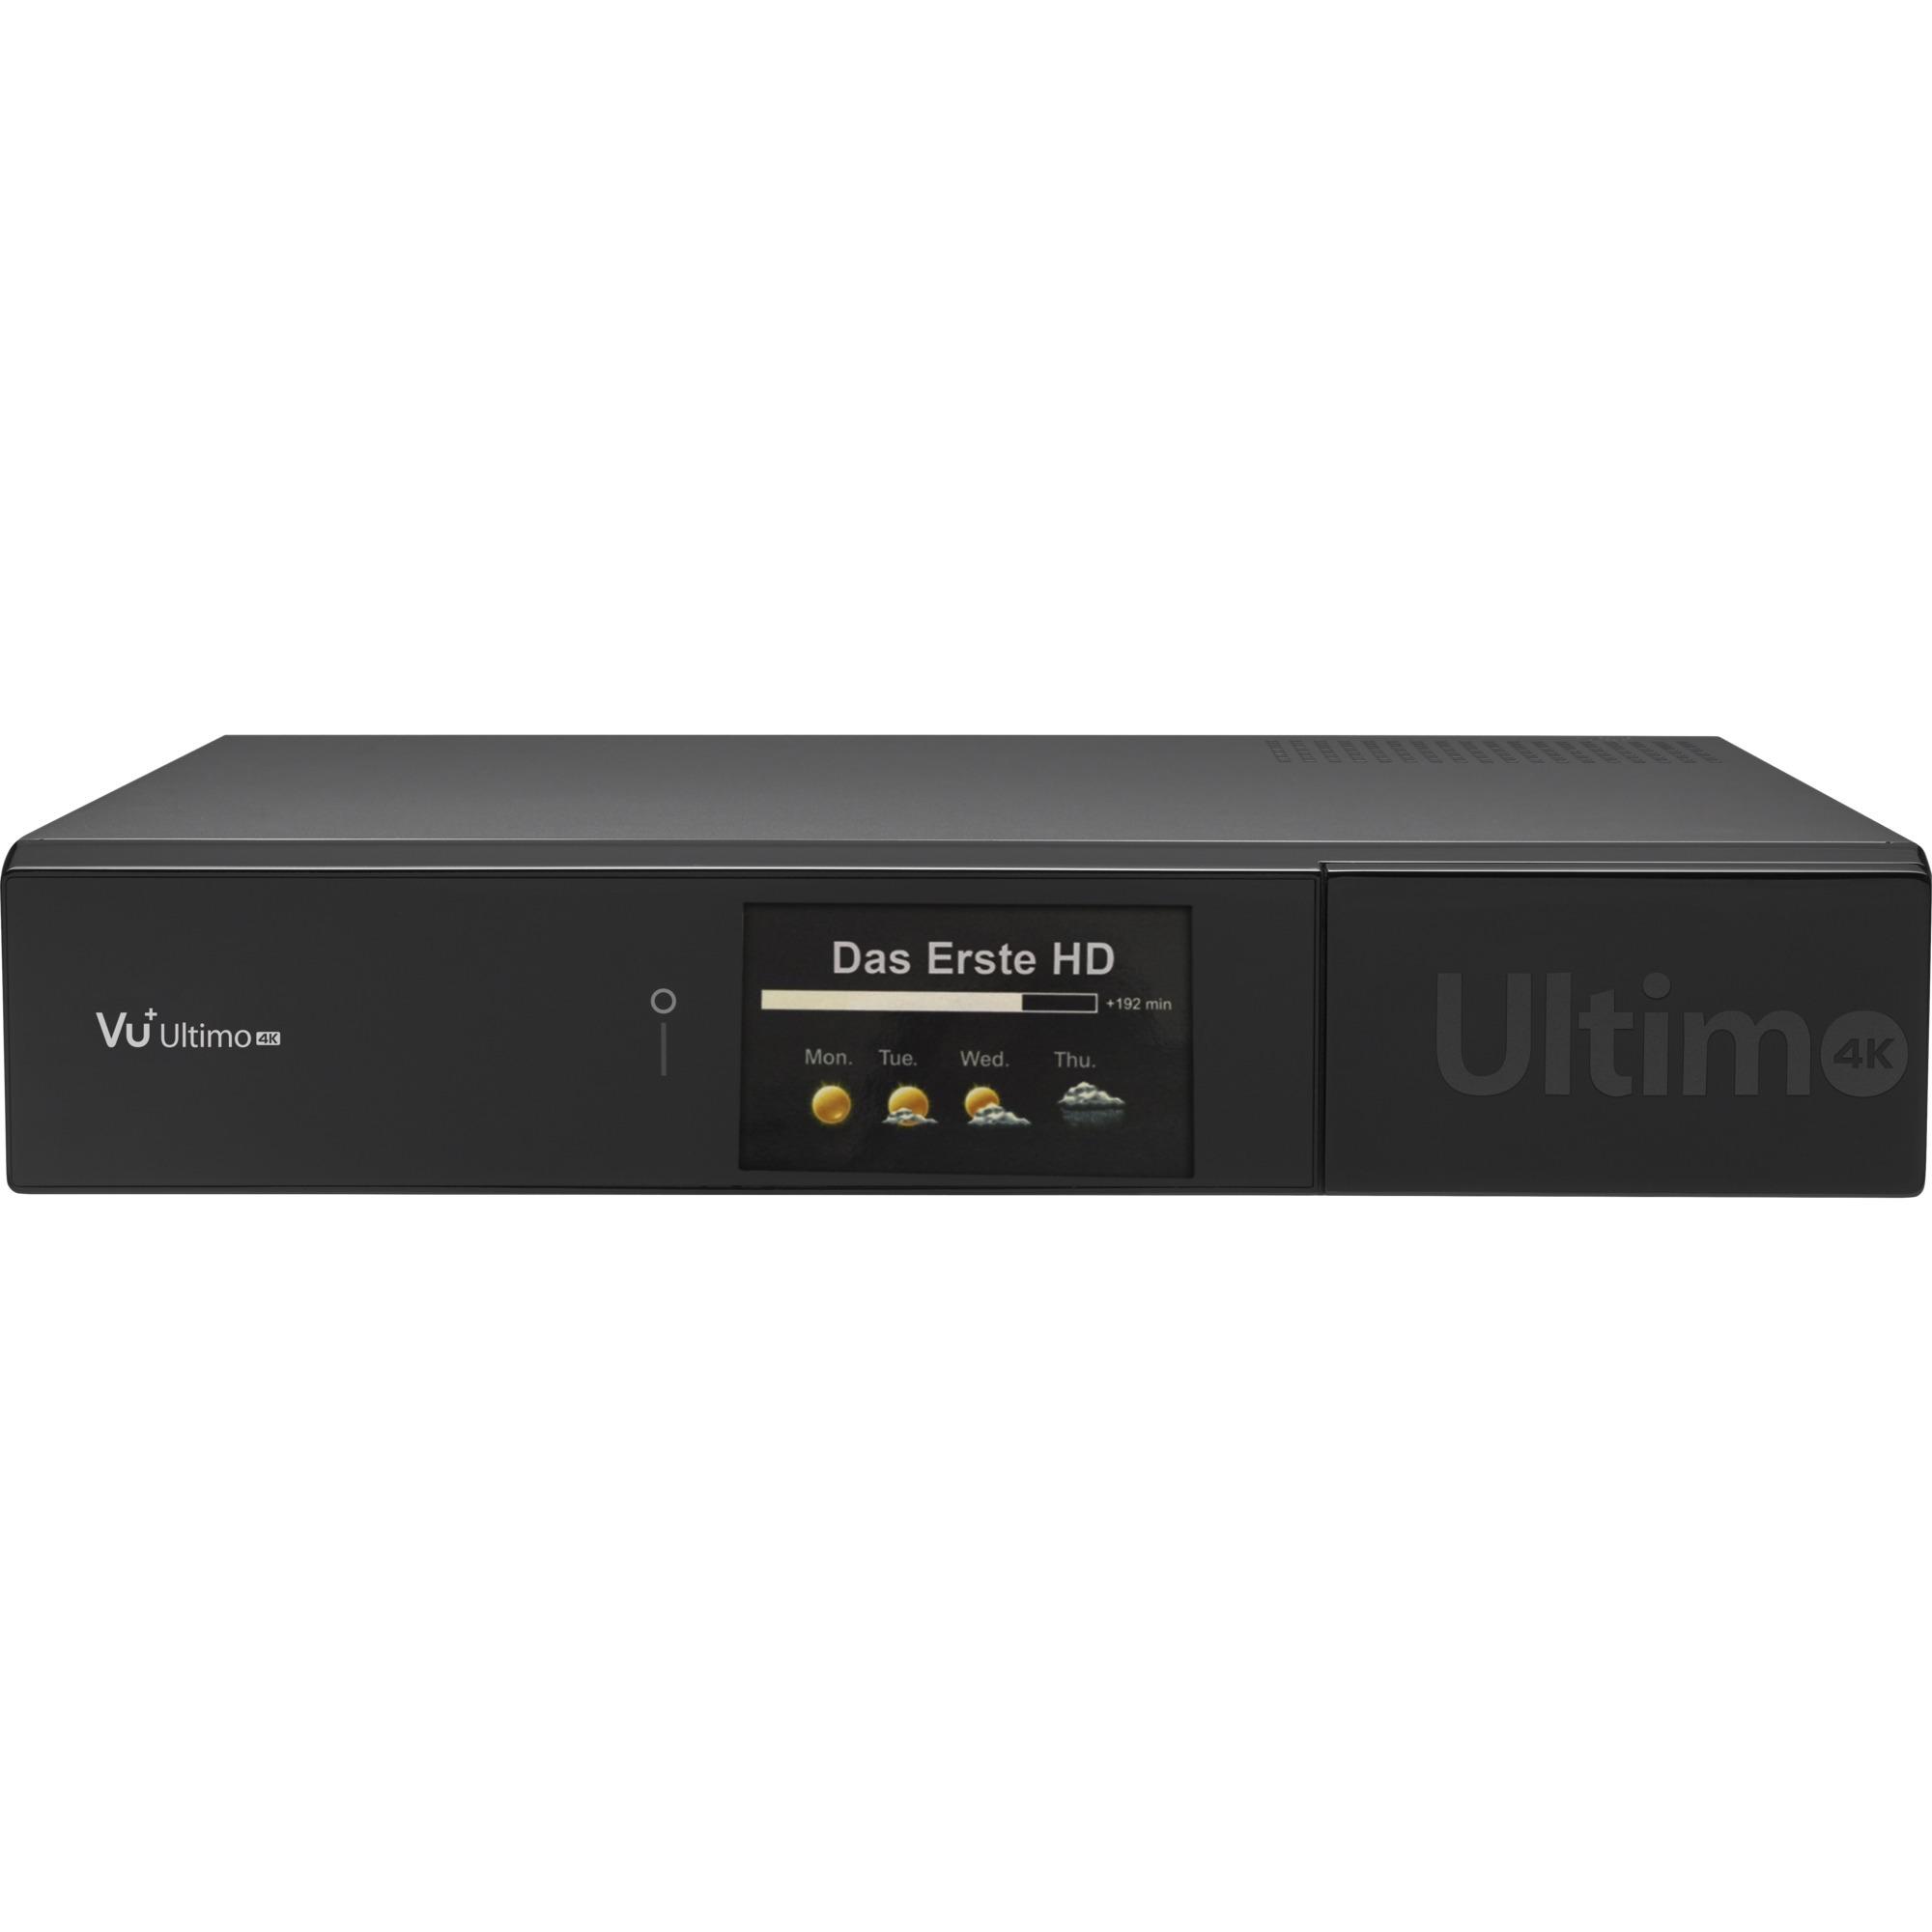 Ultimo 4K Satellite Full HD Noir TV set-top boxe, Récepteur satellite